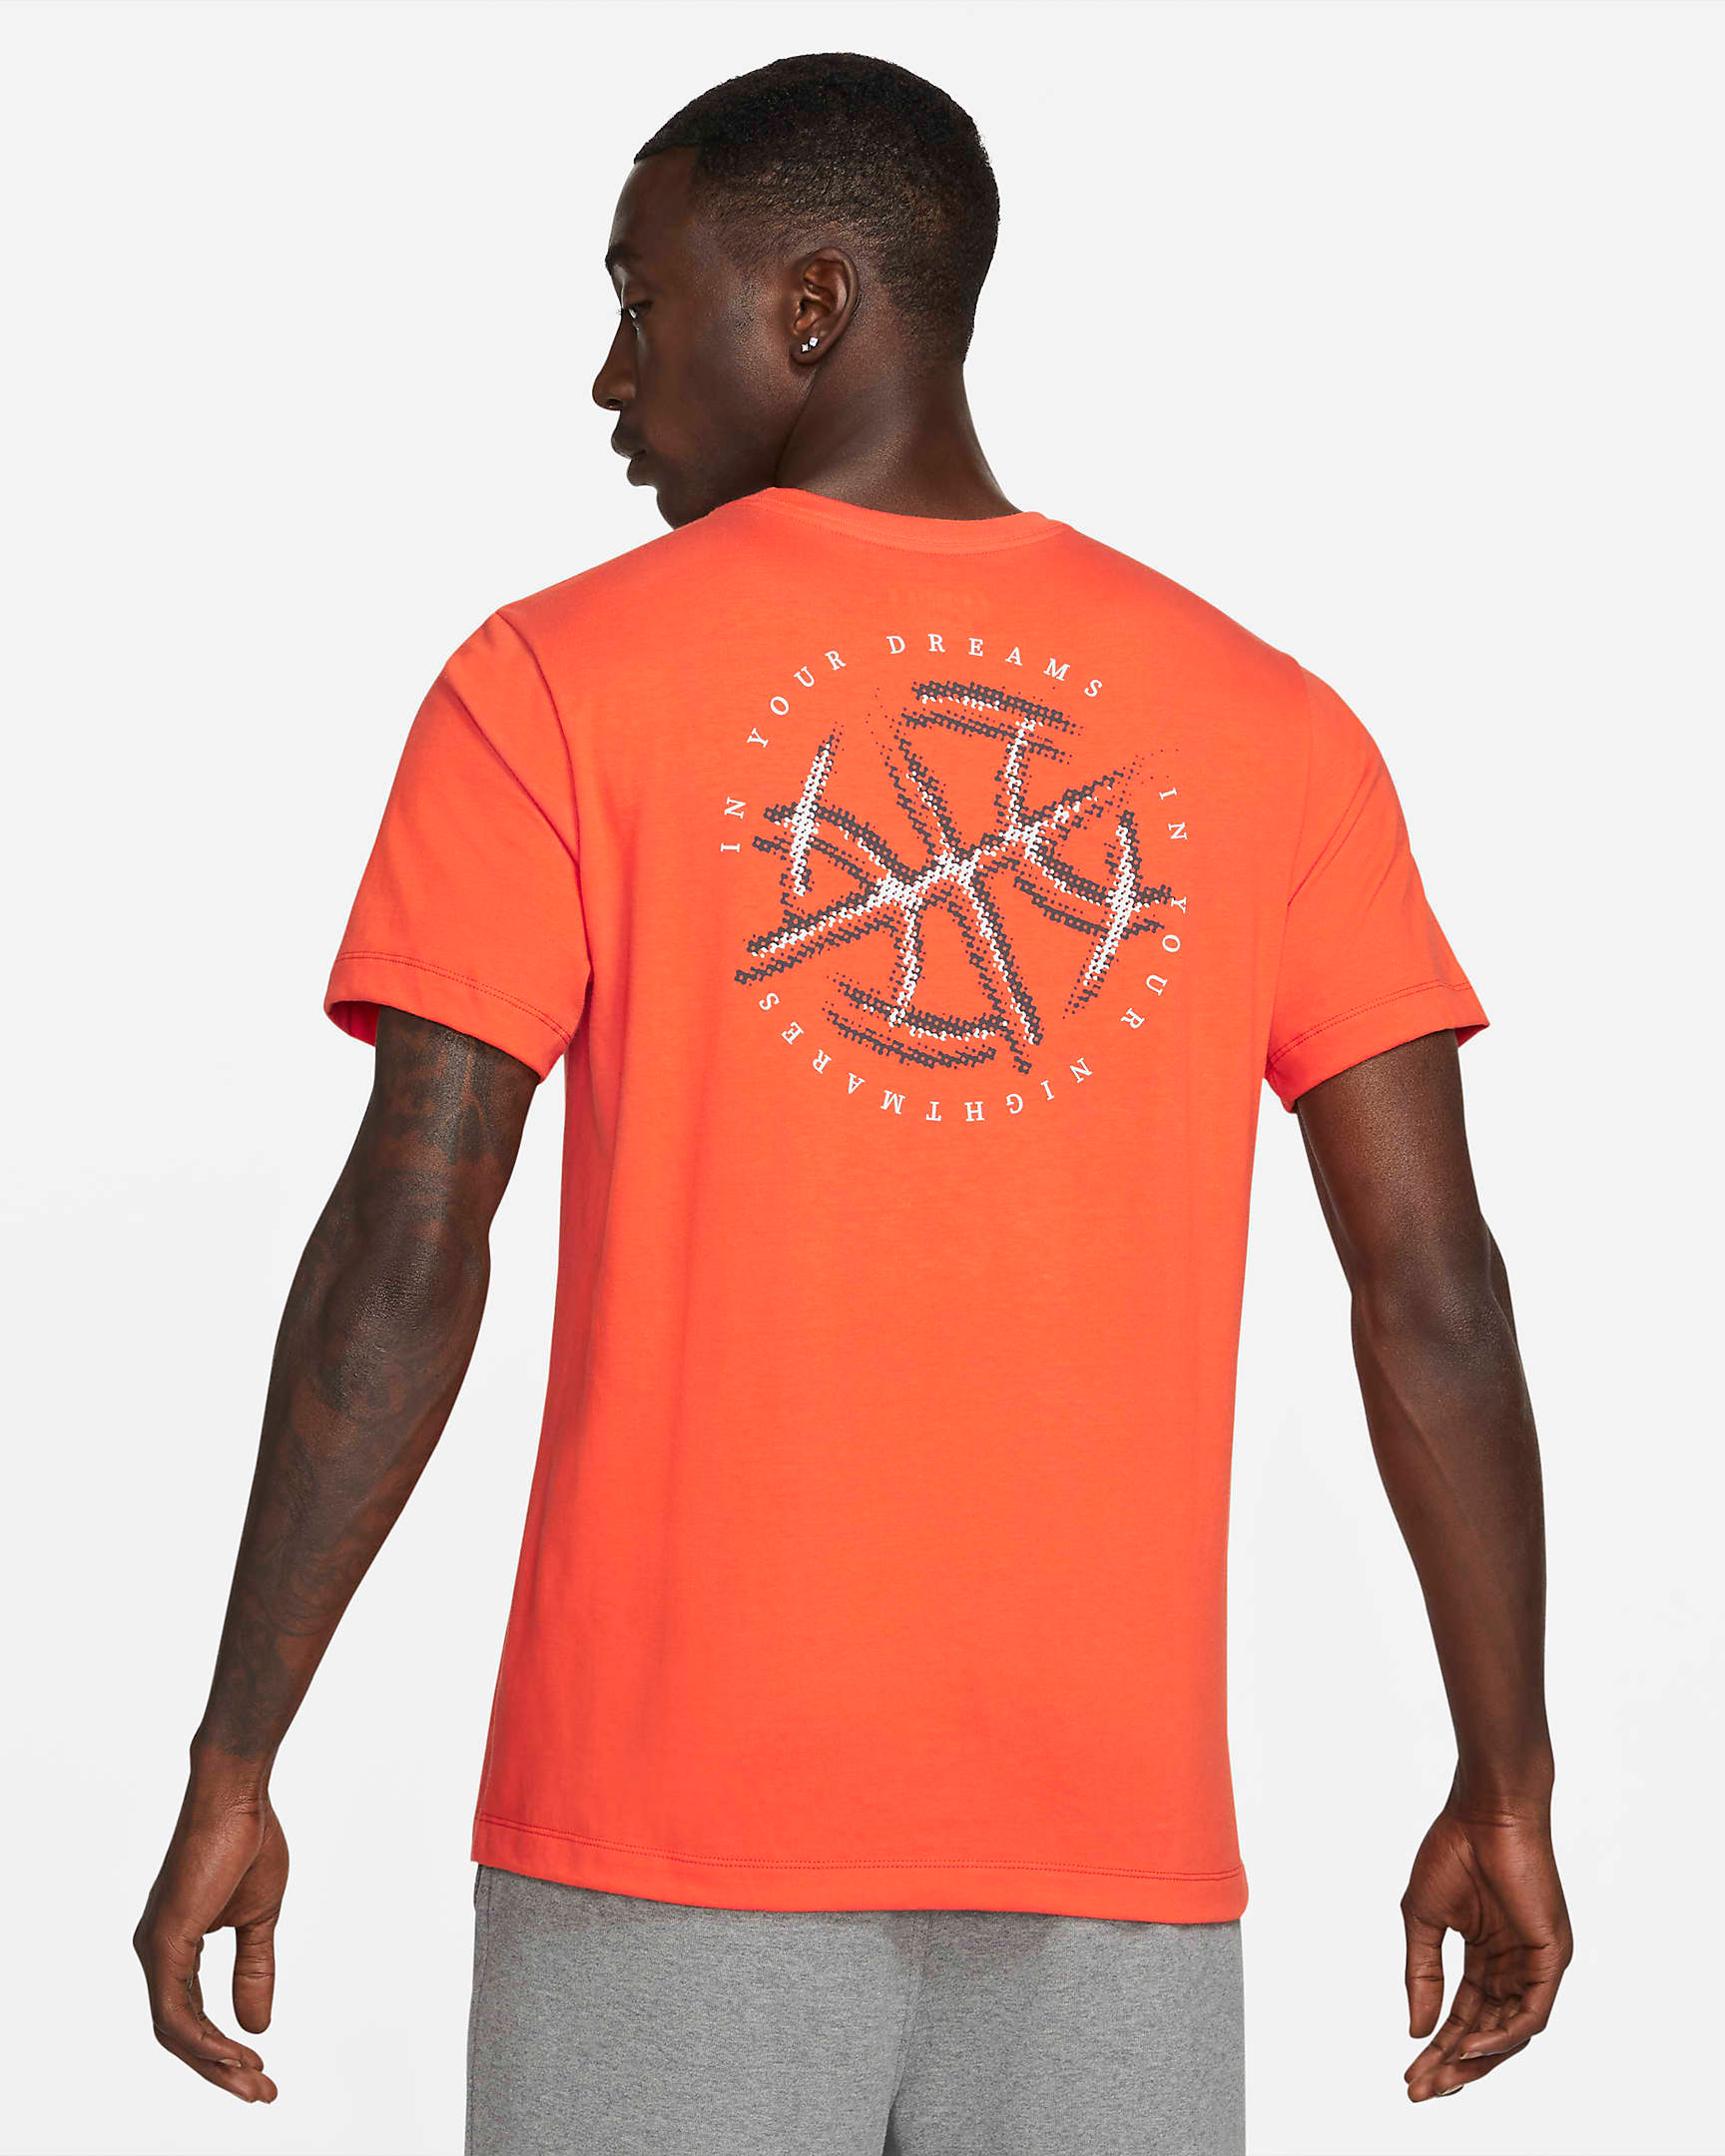 jordan-orange-sport-dna-t-shirt-2